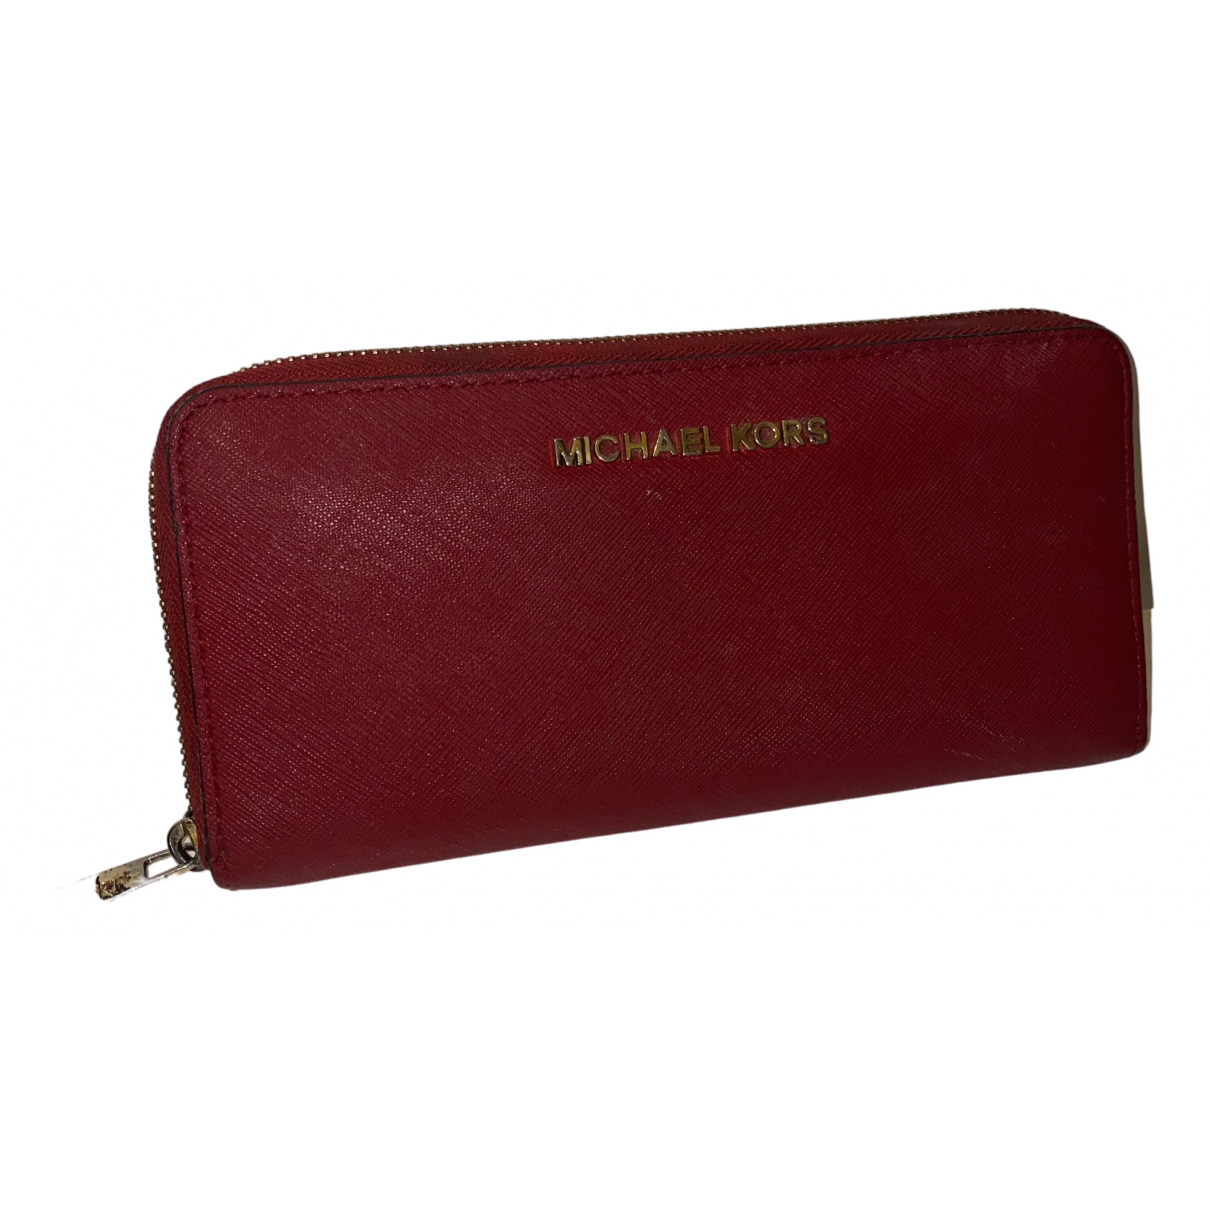 Michael Kors \N Red Leather wallet for Women \N